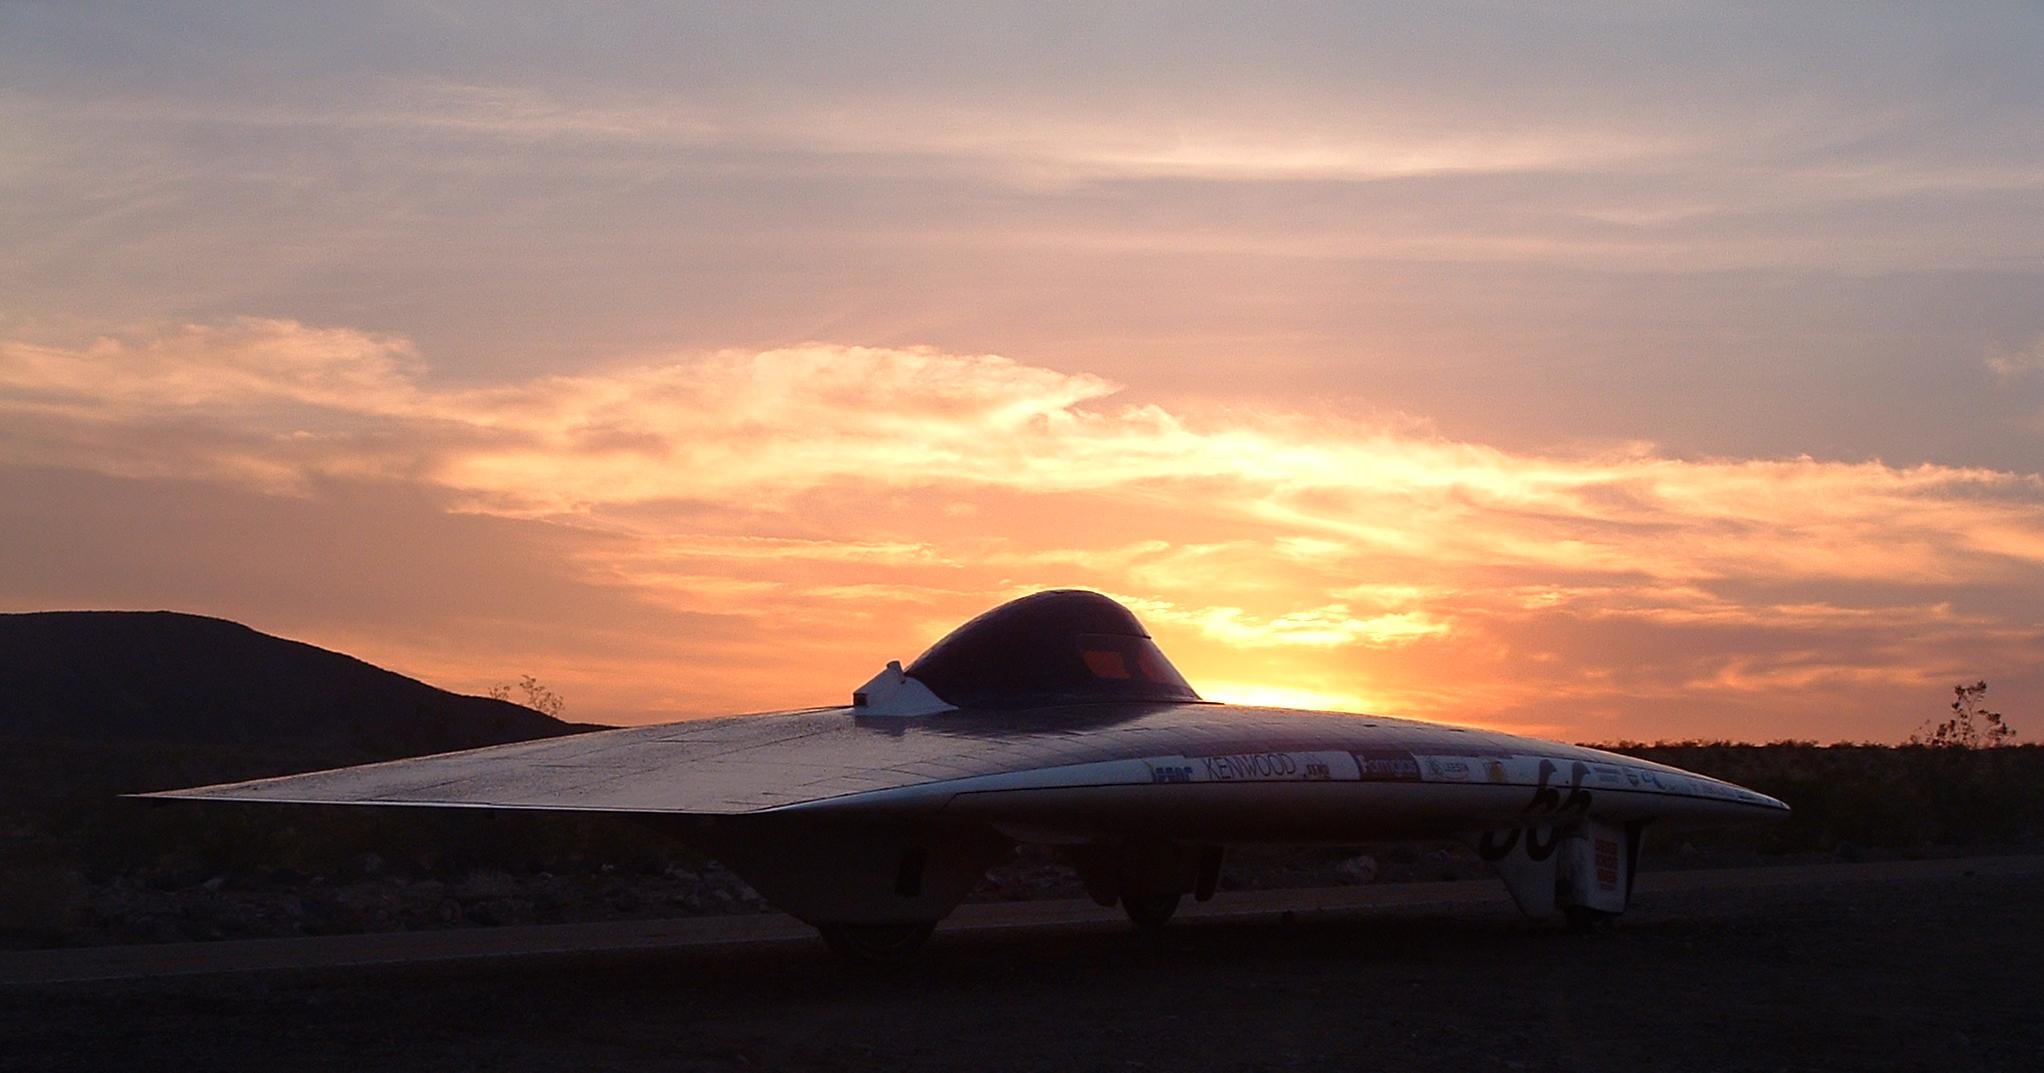 The iSun solar car in the California desert during the 2003 American Solar Challenge.